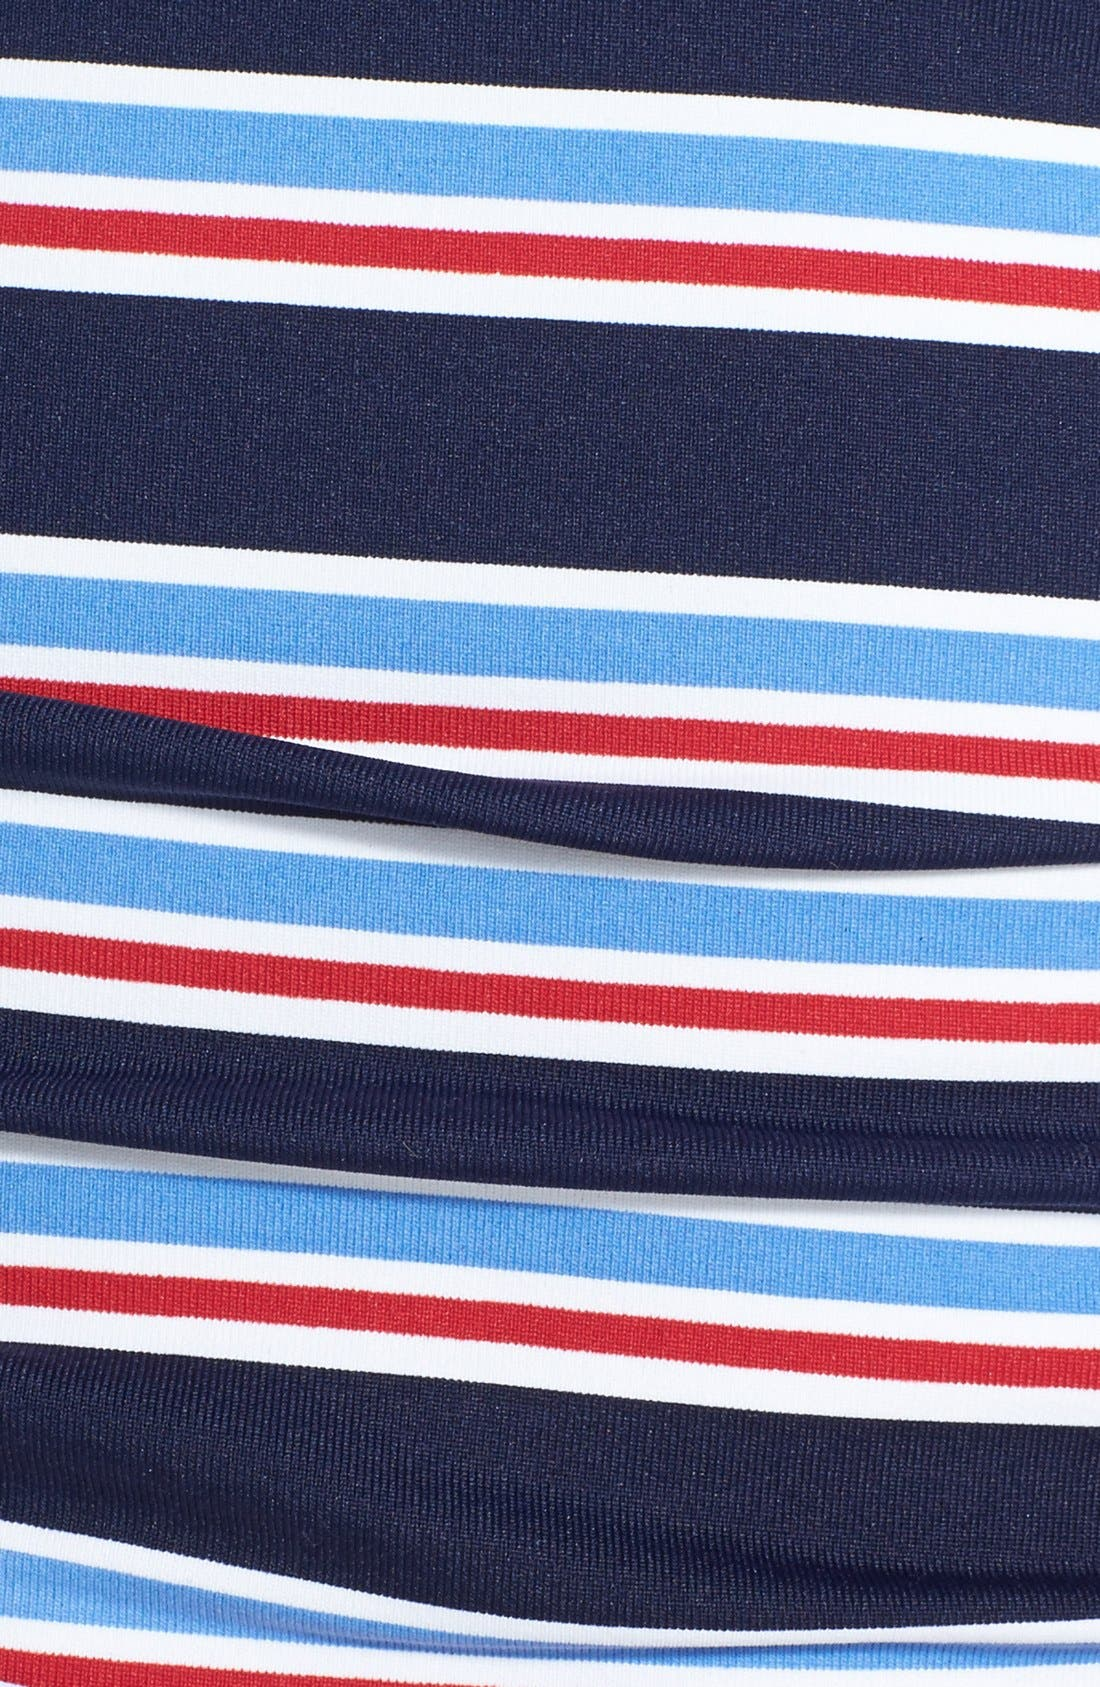 Alternate Image 3  - Tommy Bahama 'Stripe & Medallion' Halter Tankini Top